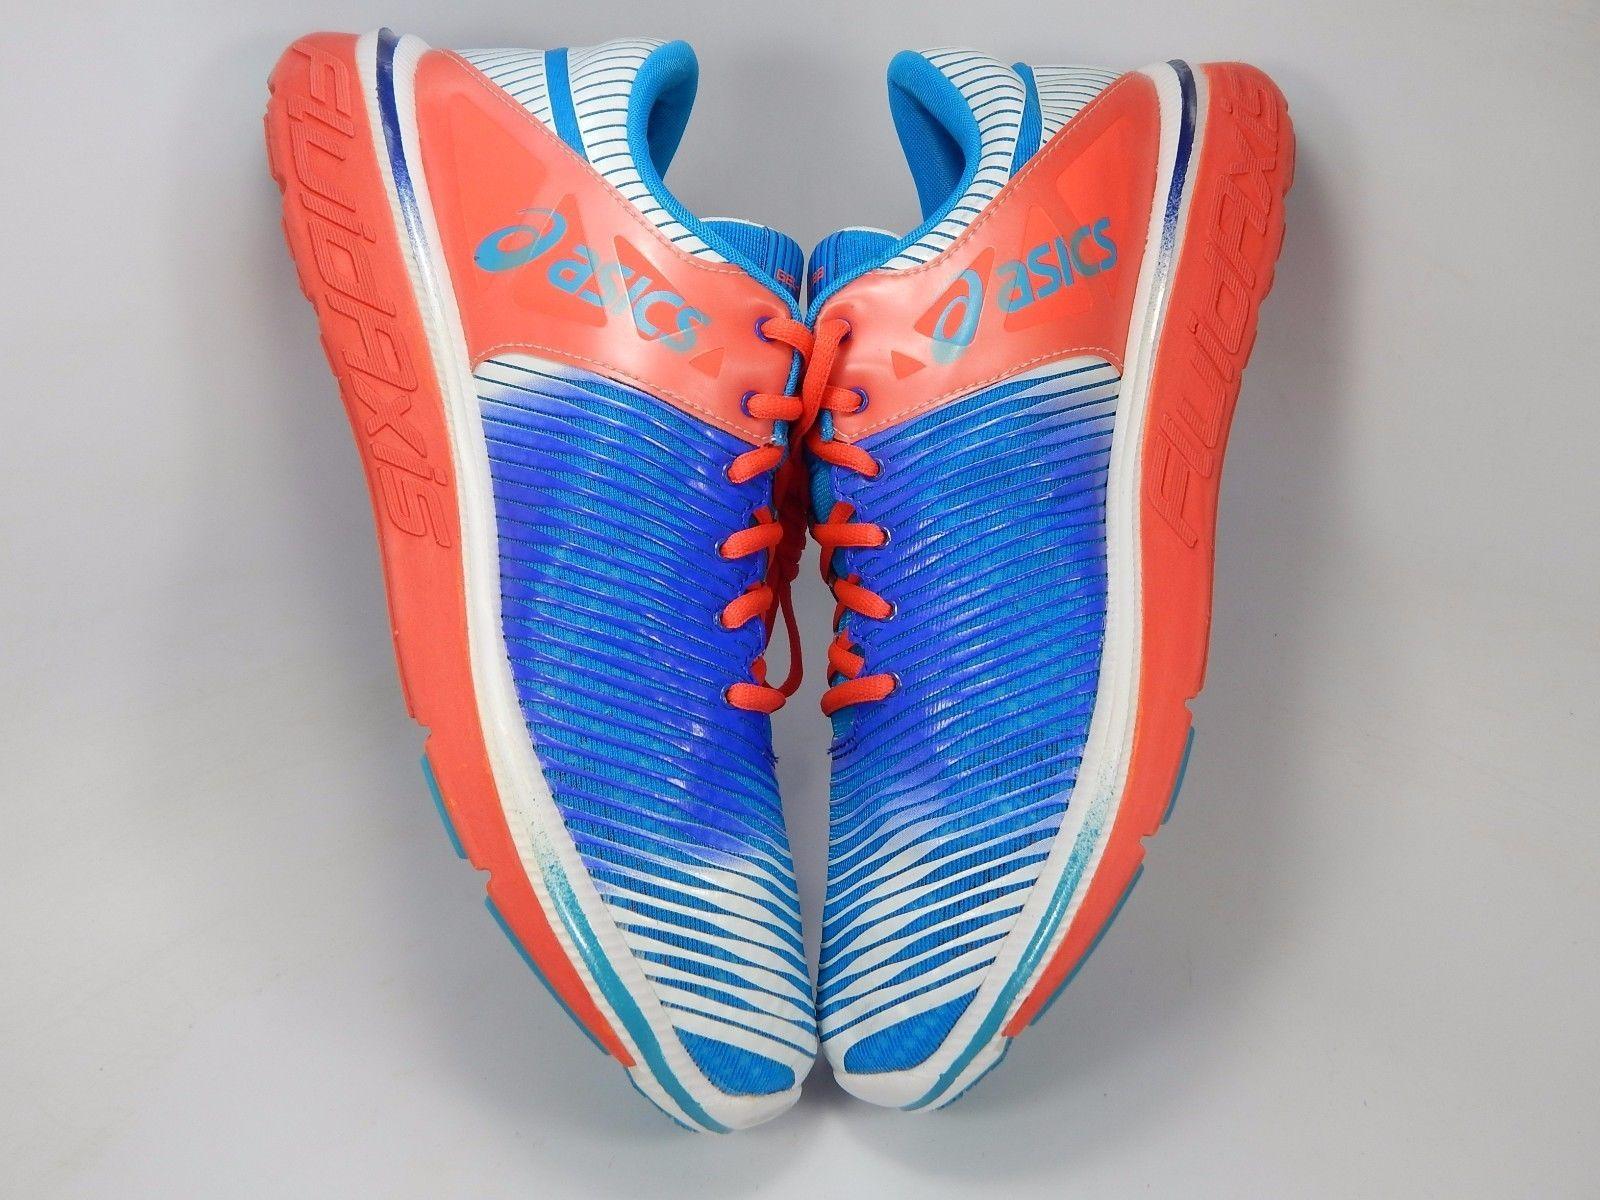 Asics Gel Super J33 Women's Running Shoes Size US 11.5 M (B) EU 44 Blue T3S5N